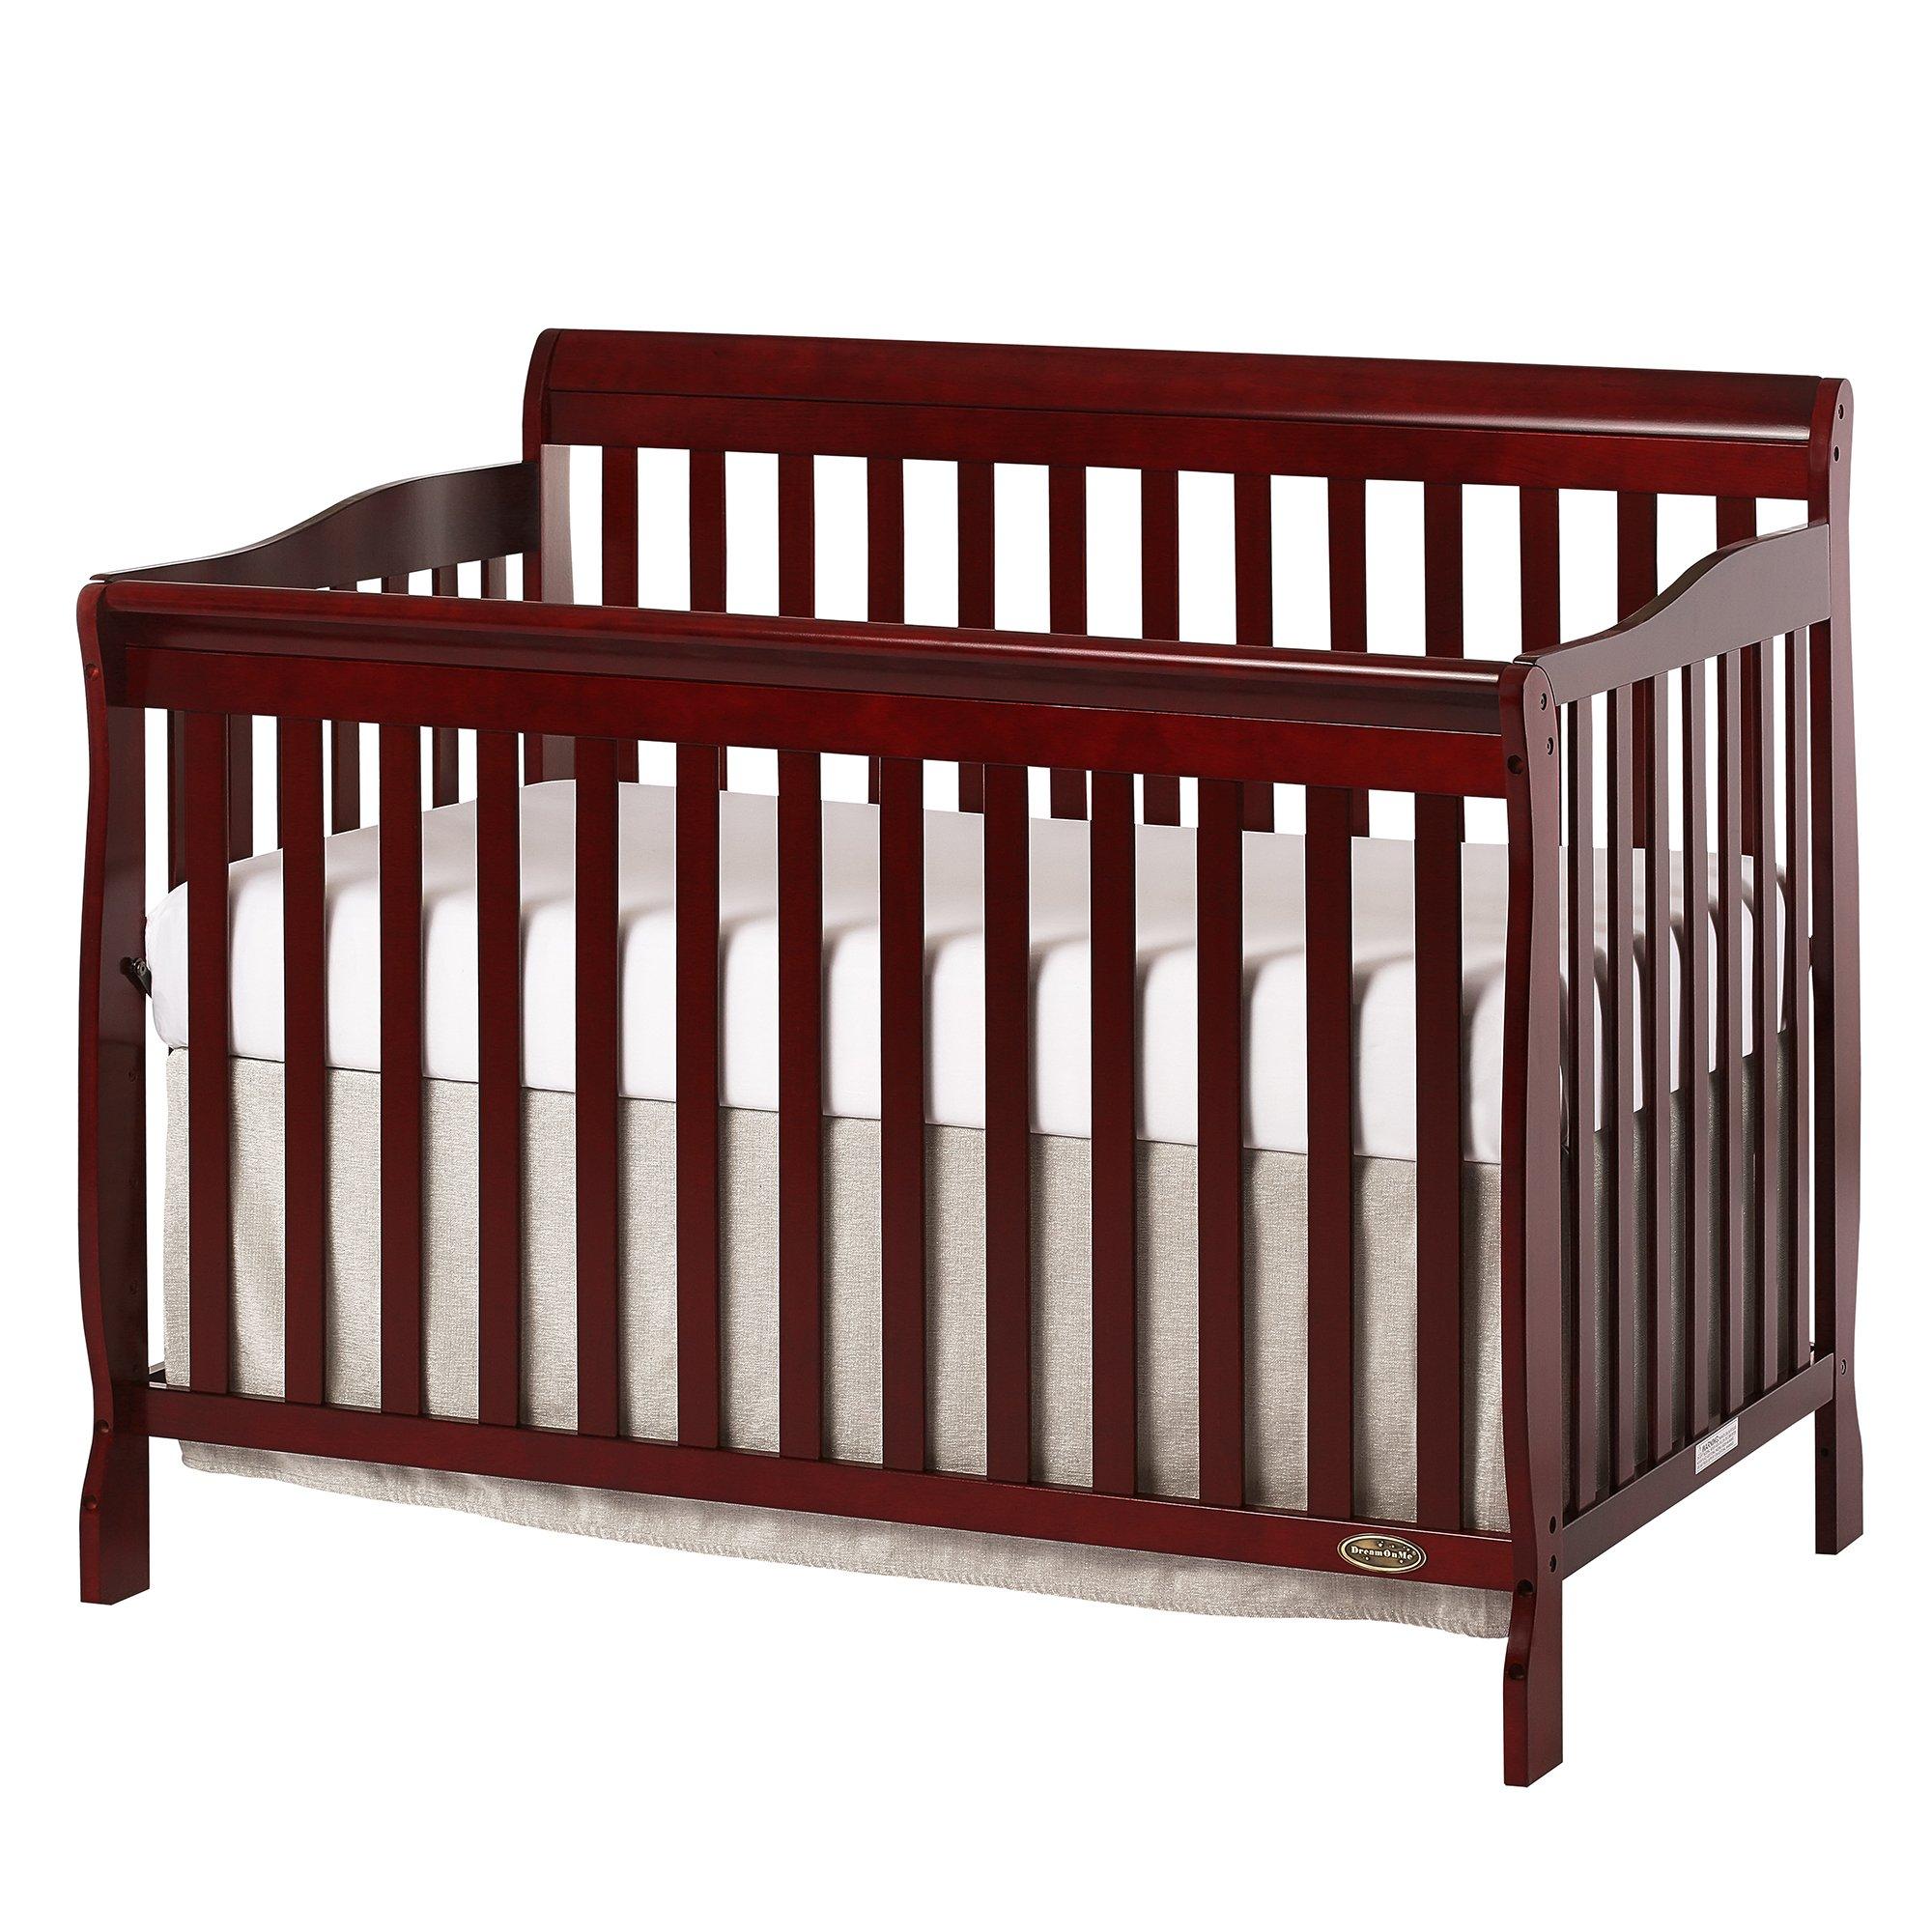 dollar dream million warm mdb dresser crib baby package white double tanner cribs